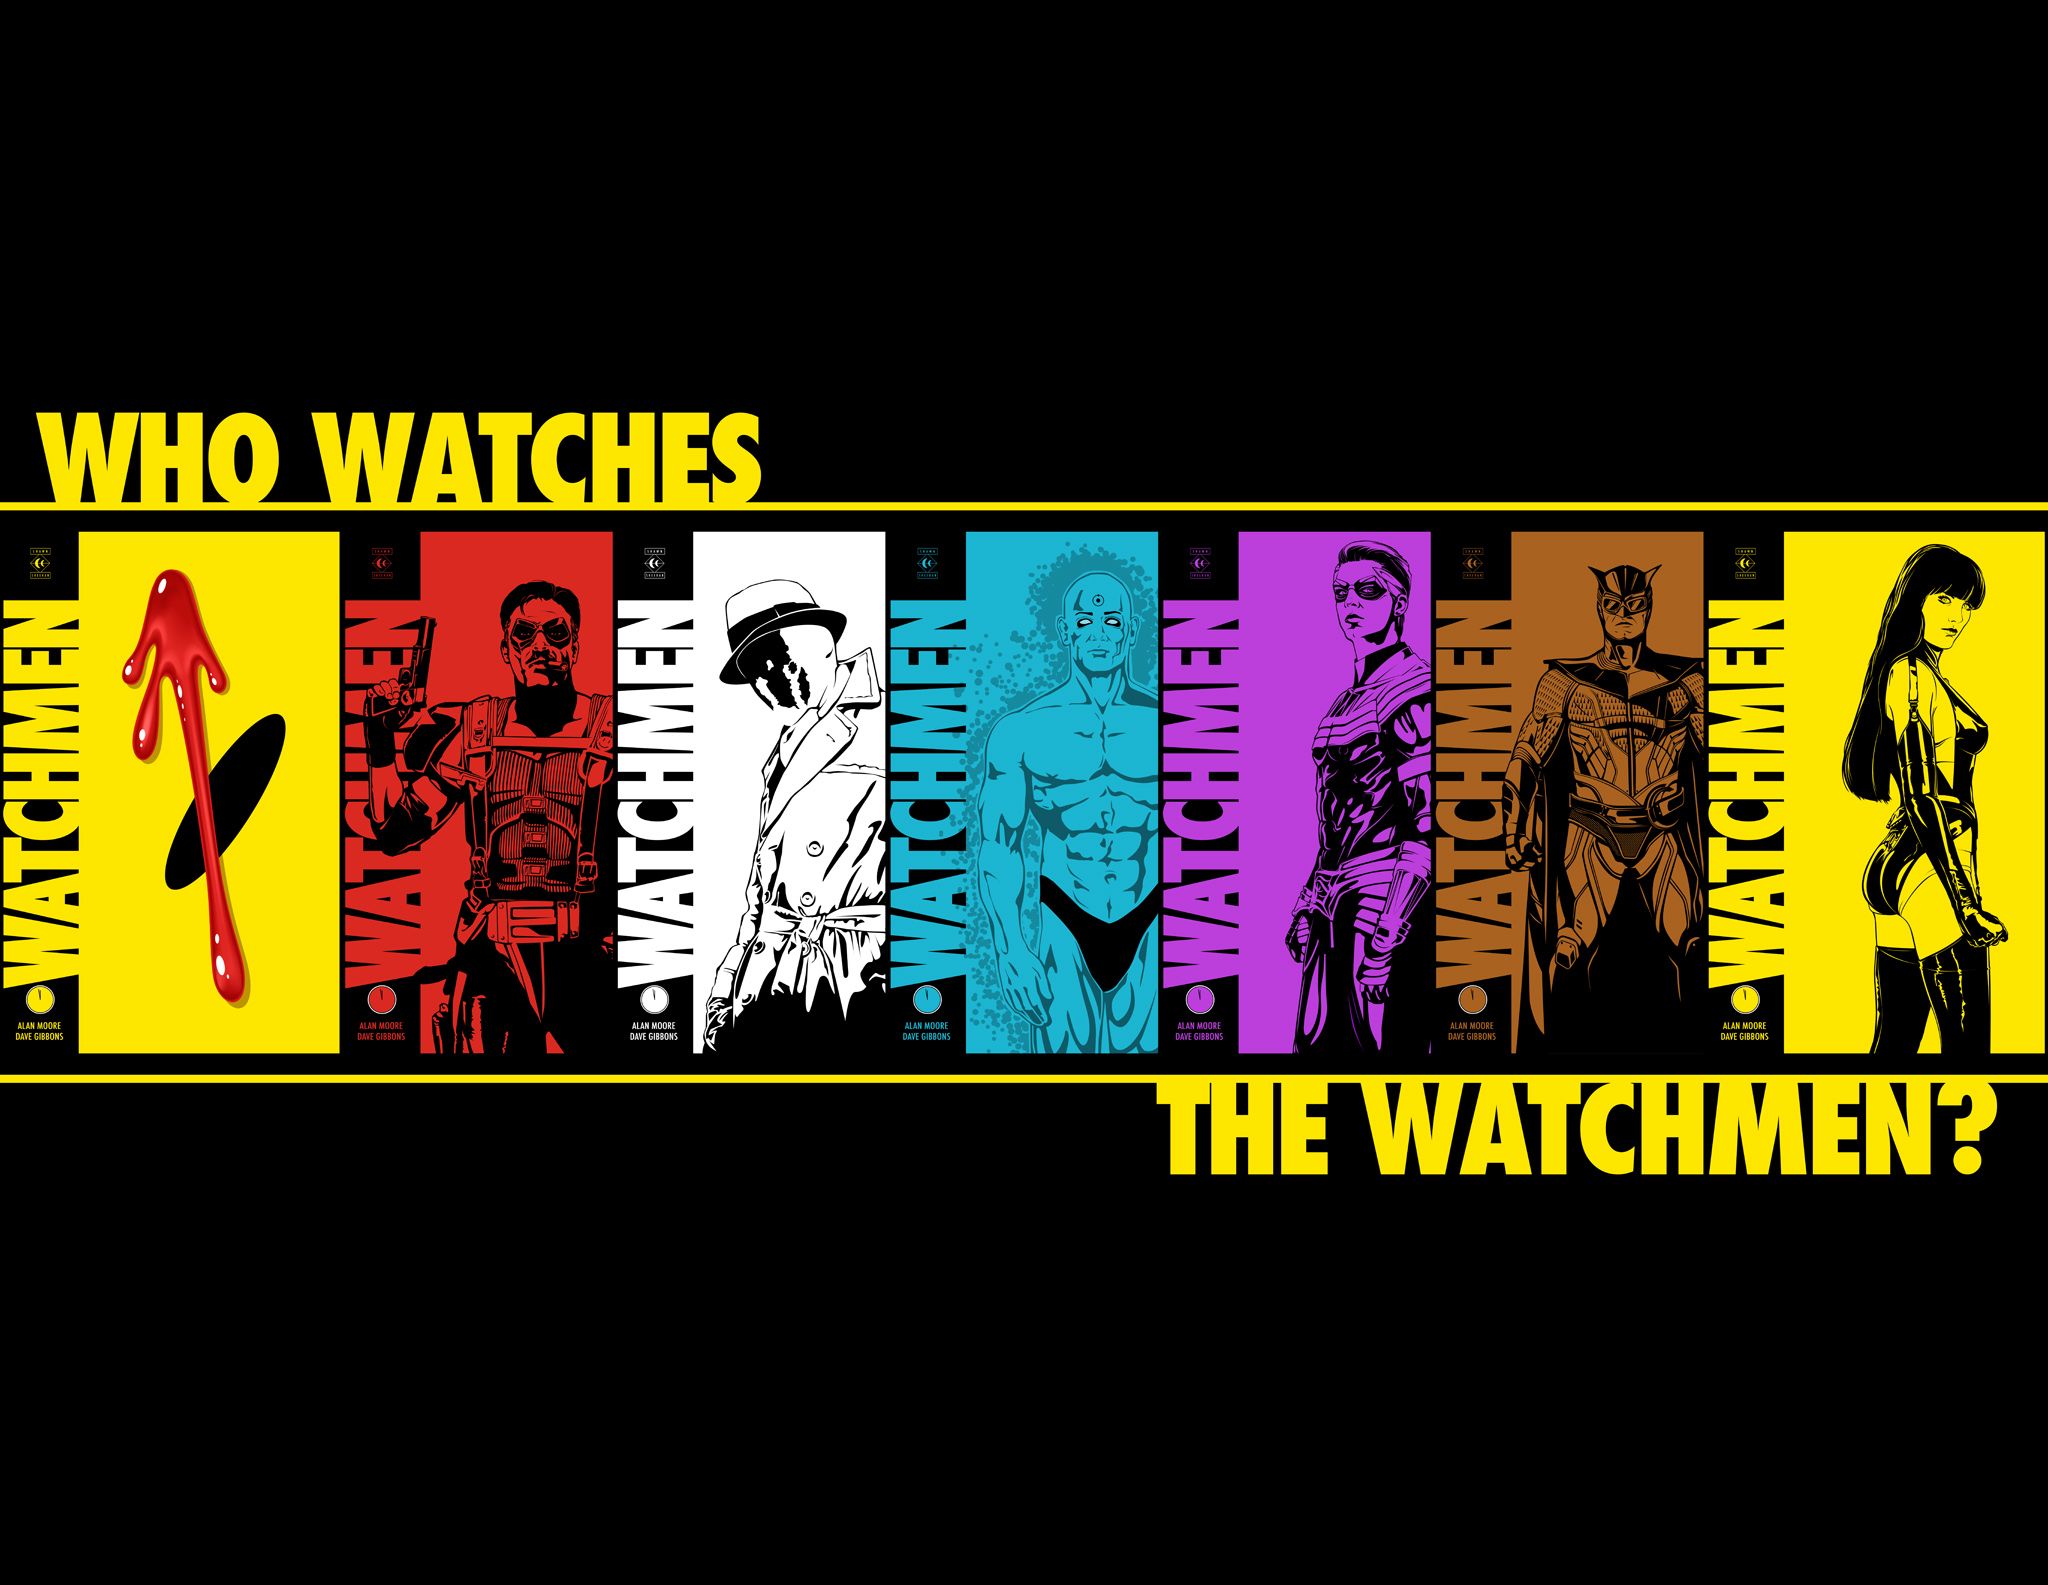 Watchmen_Covers.jpg